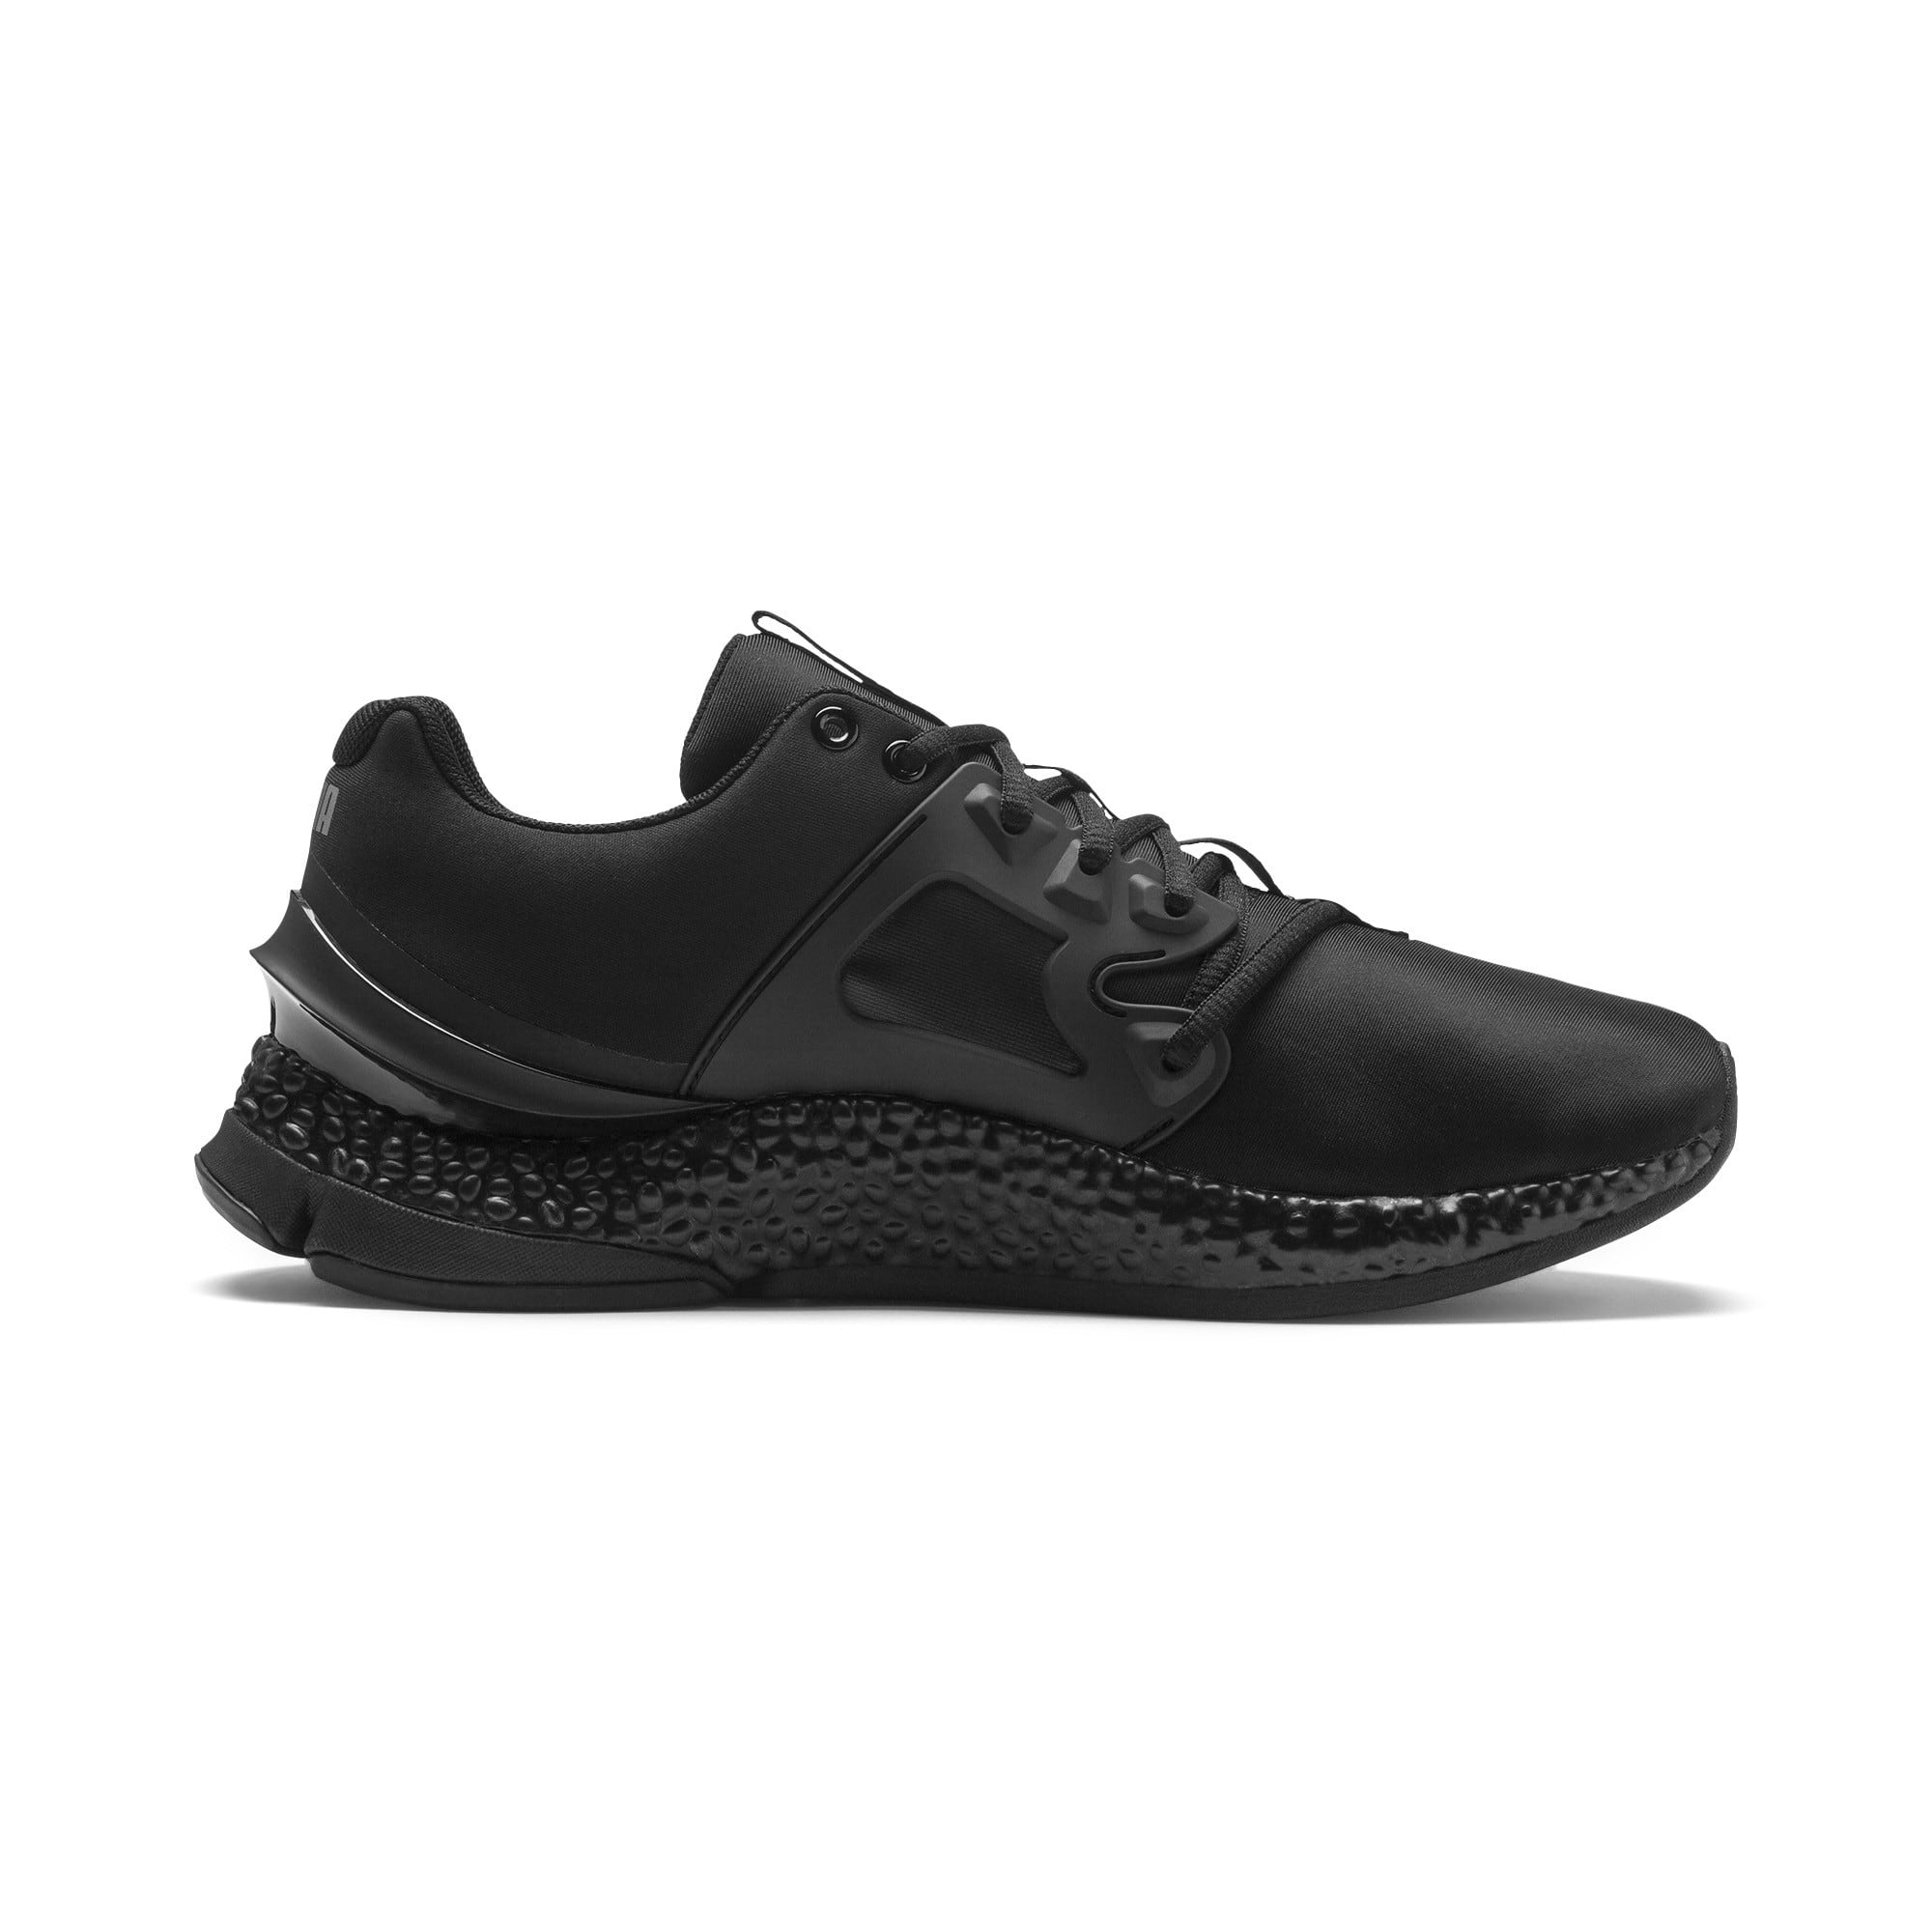 Thumbnail 6 of HYBRID Sky Rave Men's Running Shoes, Puma Black-Puma Aged Silver, medium